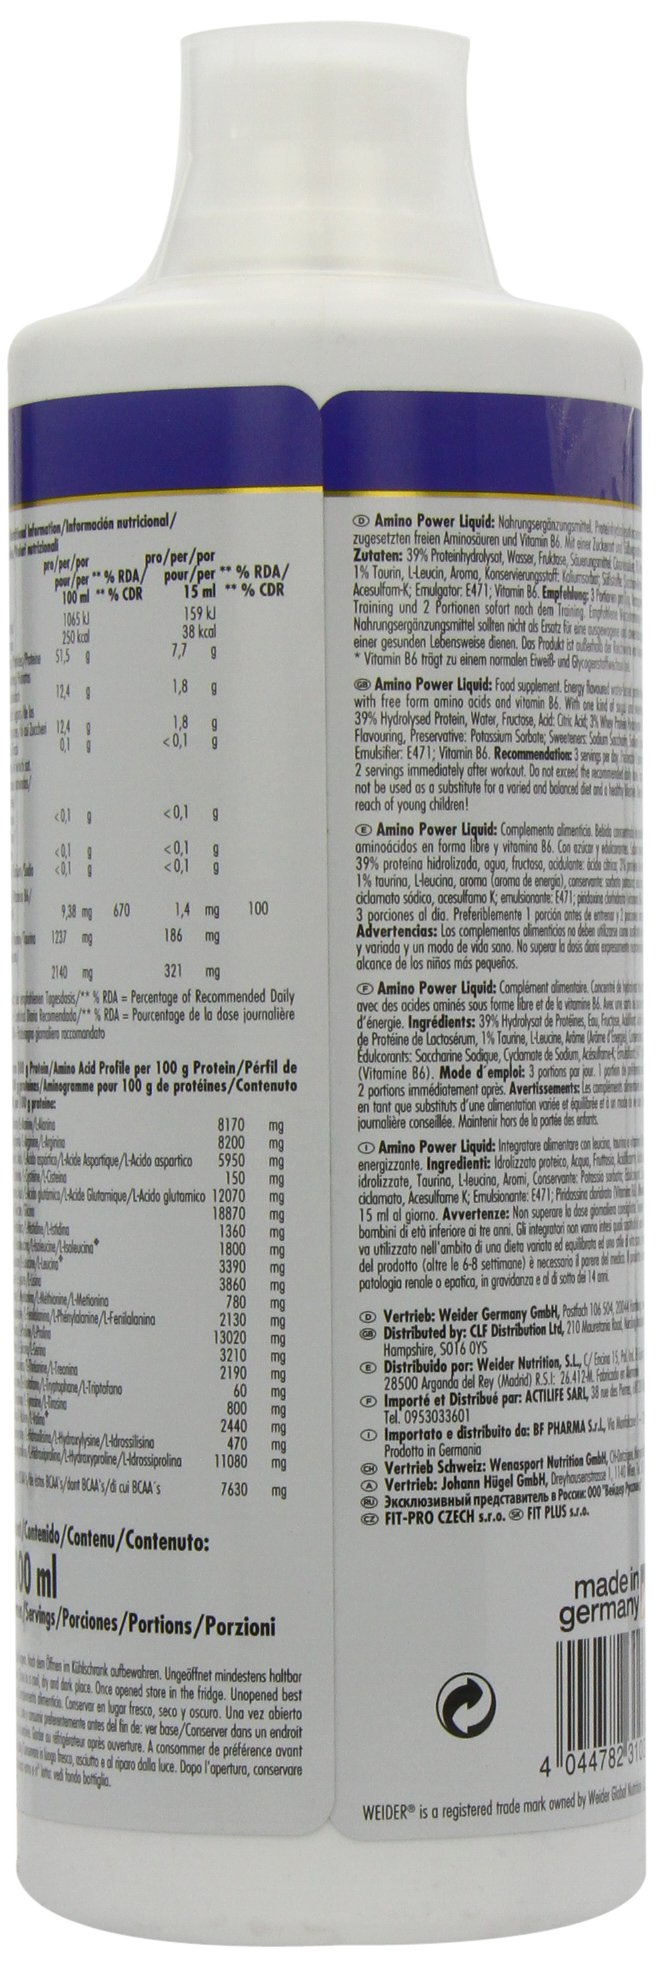 71 OzNGT7XL - Weider Amino Power Liquid 1L Energy, Essential Amino Acids, L-leucine, Free Taurine, Vitamin B8